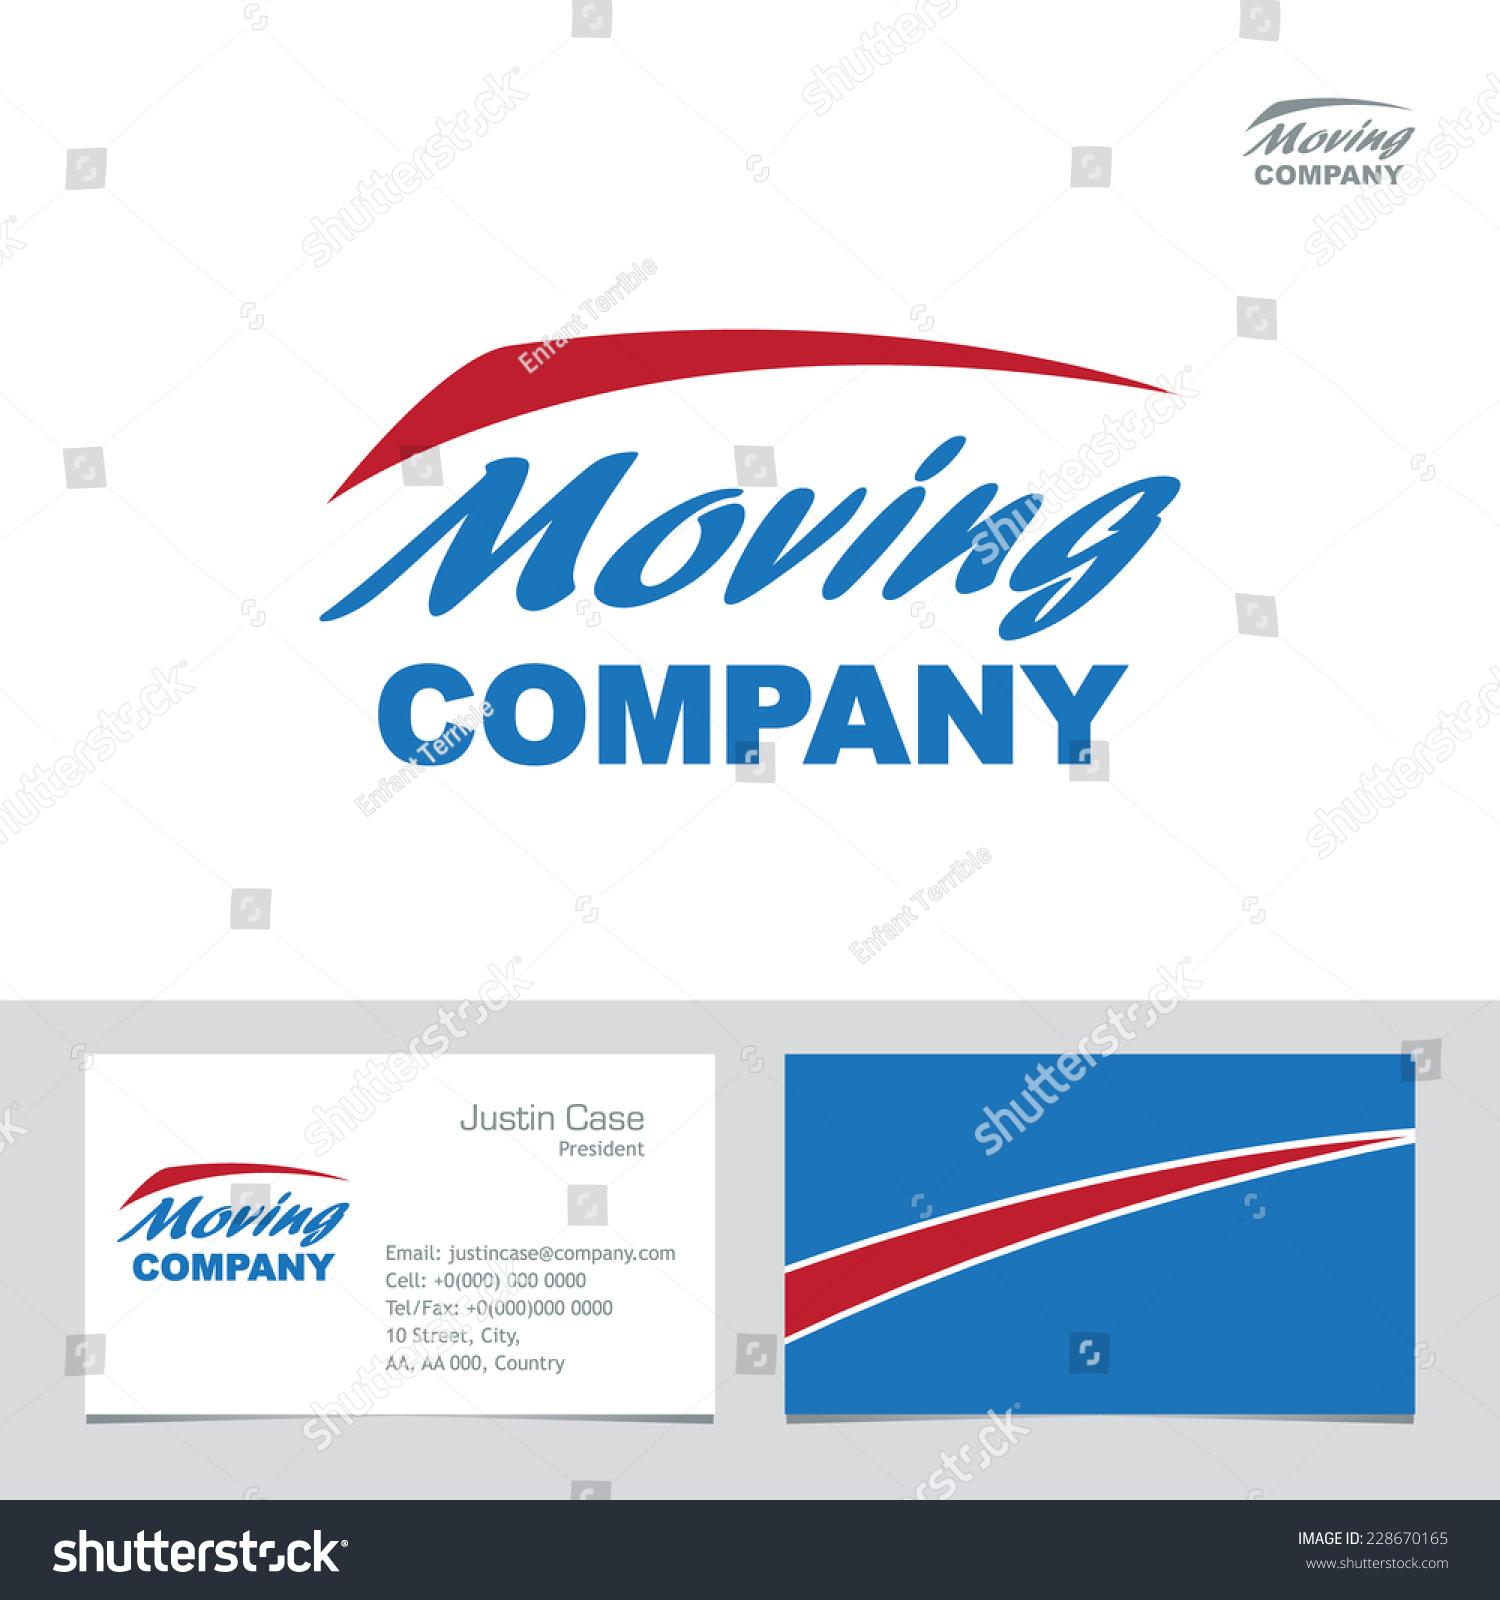 business sign template - Hayit.elcuervoazul.com